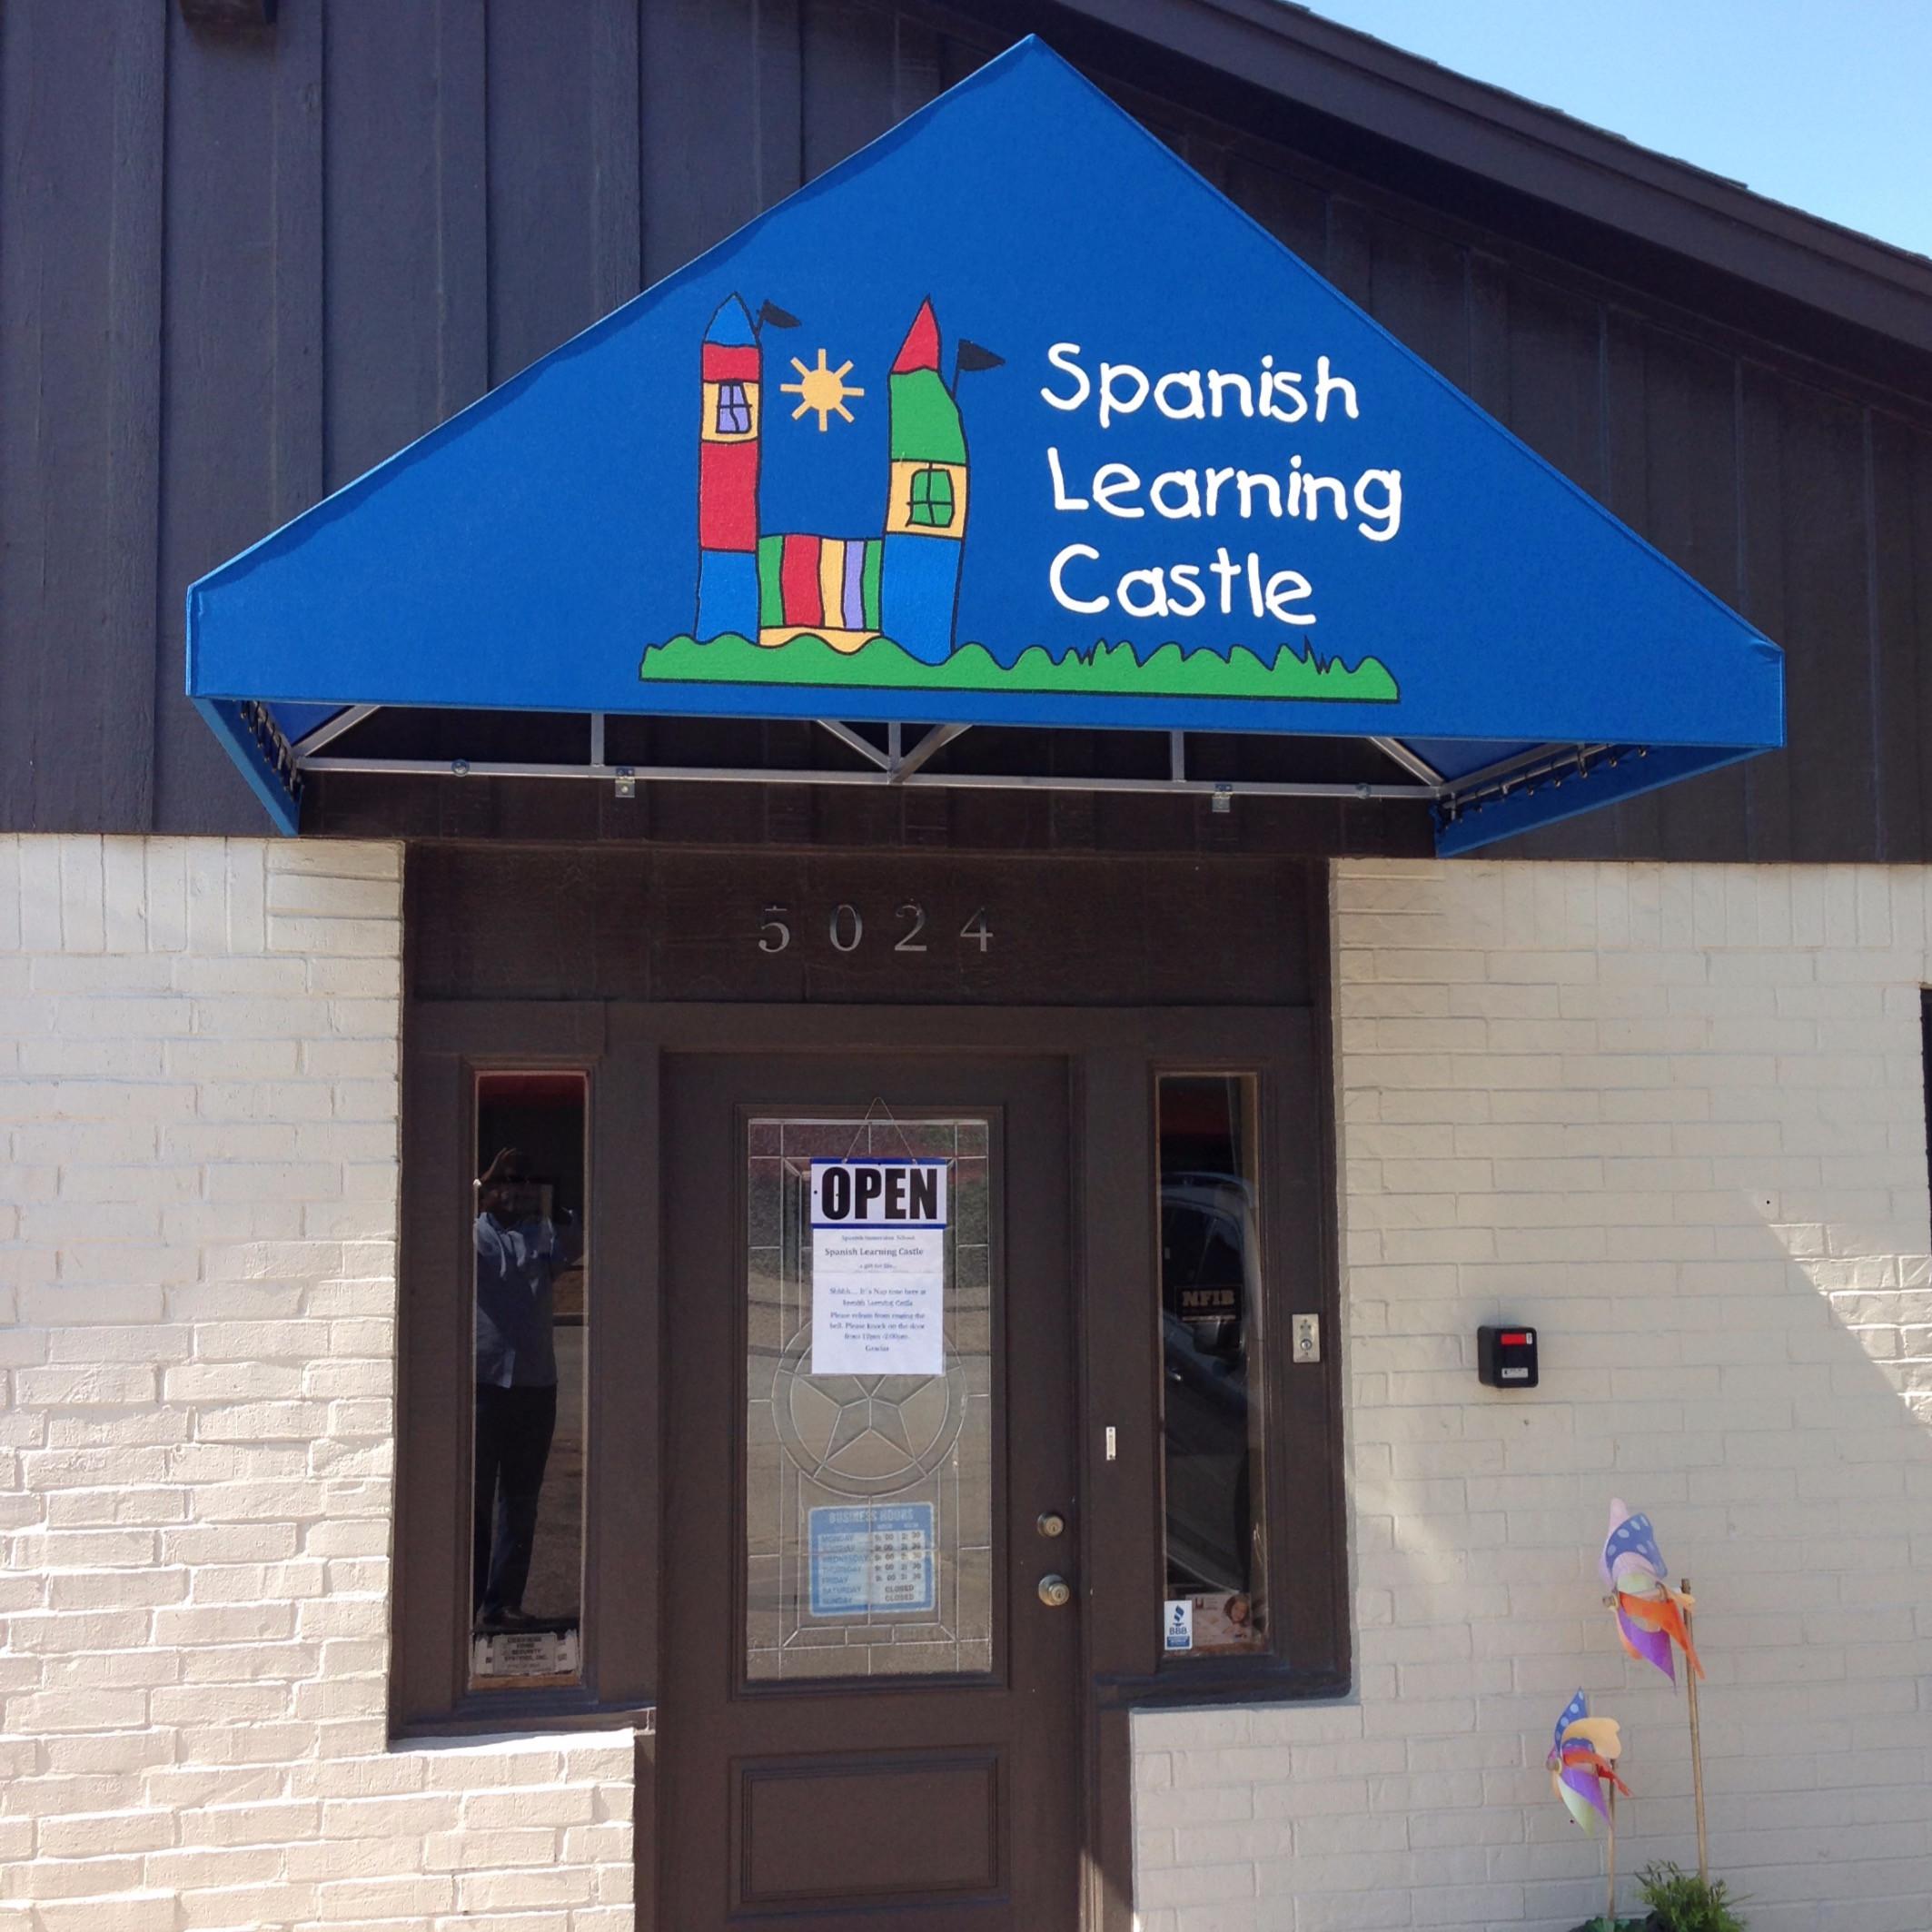 Spanish Learning Castle - Old Katy